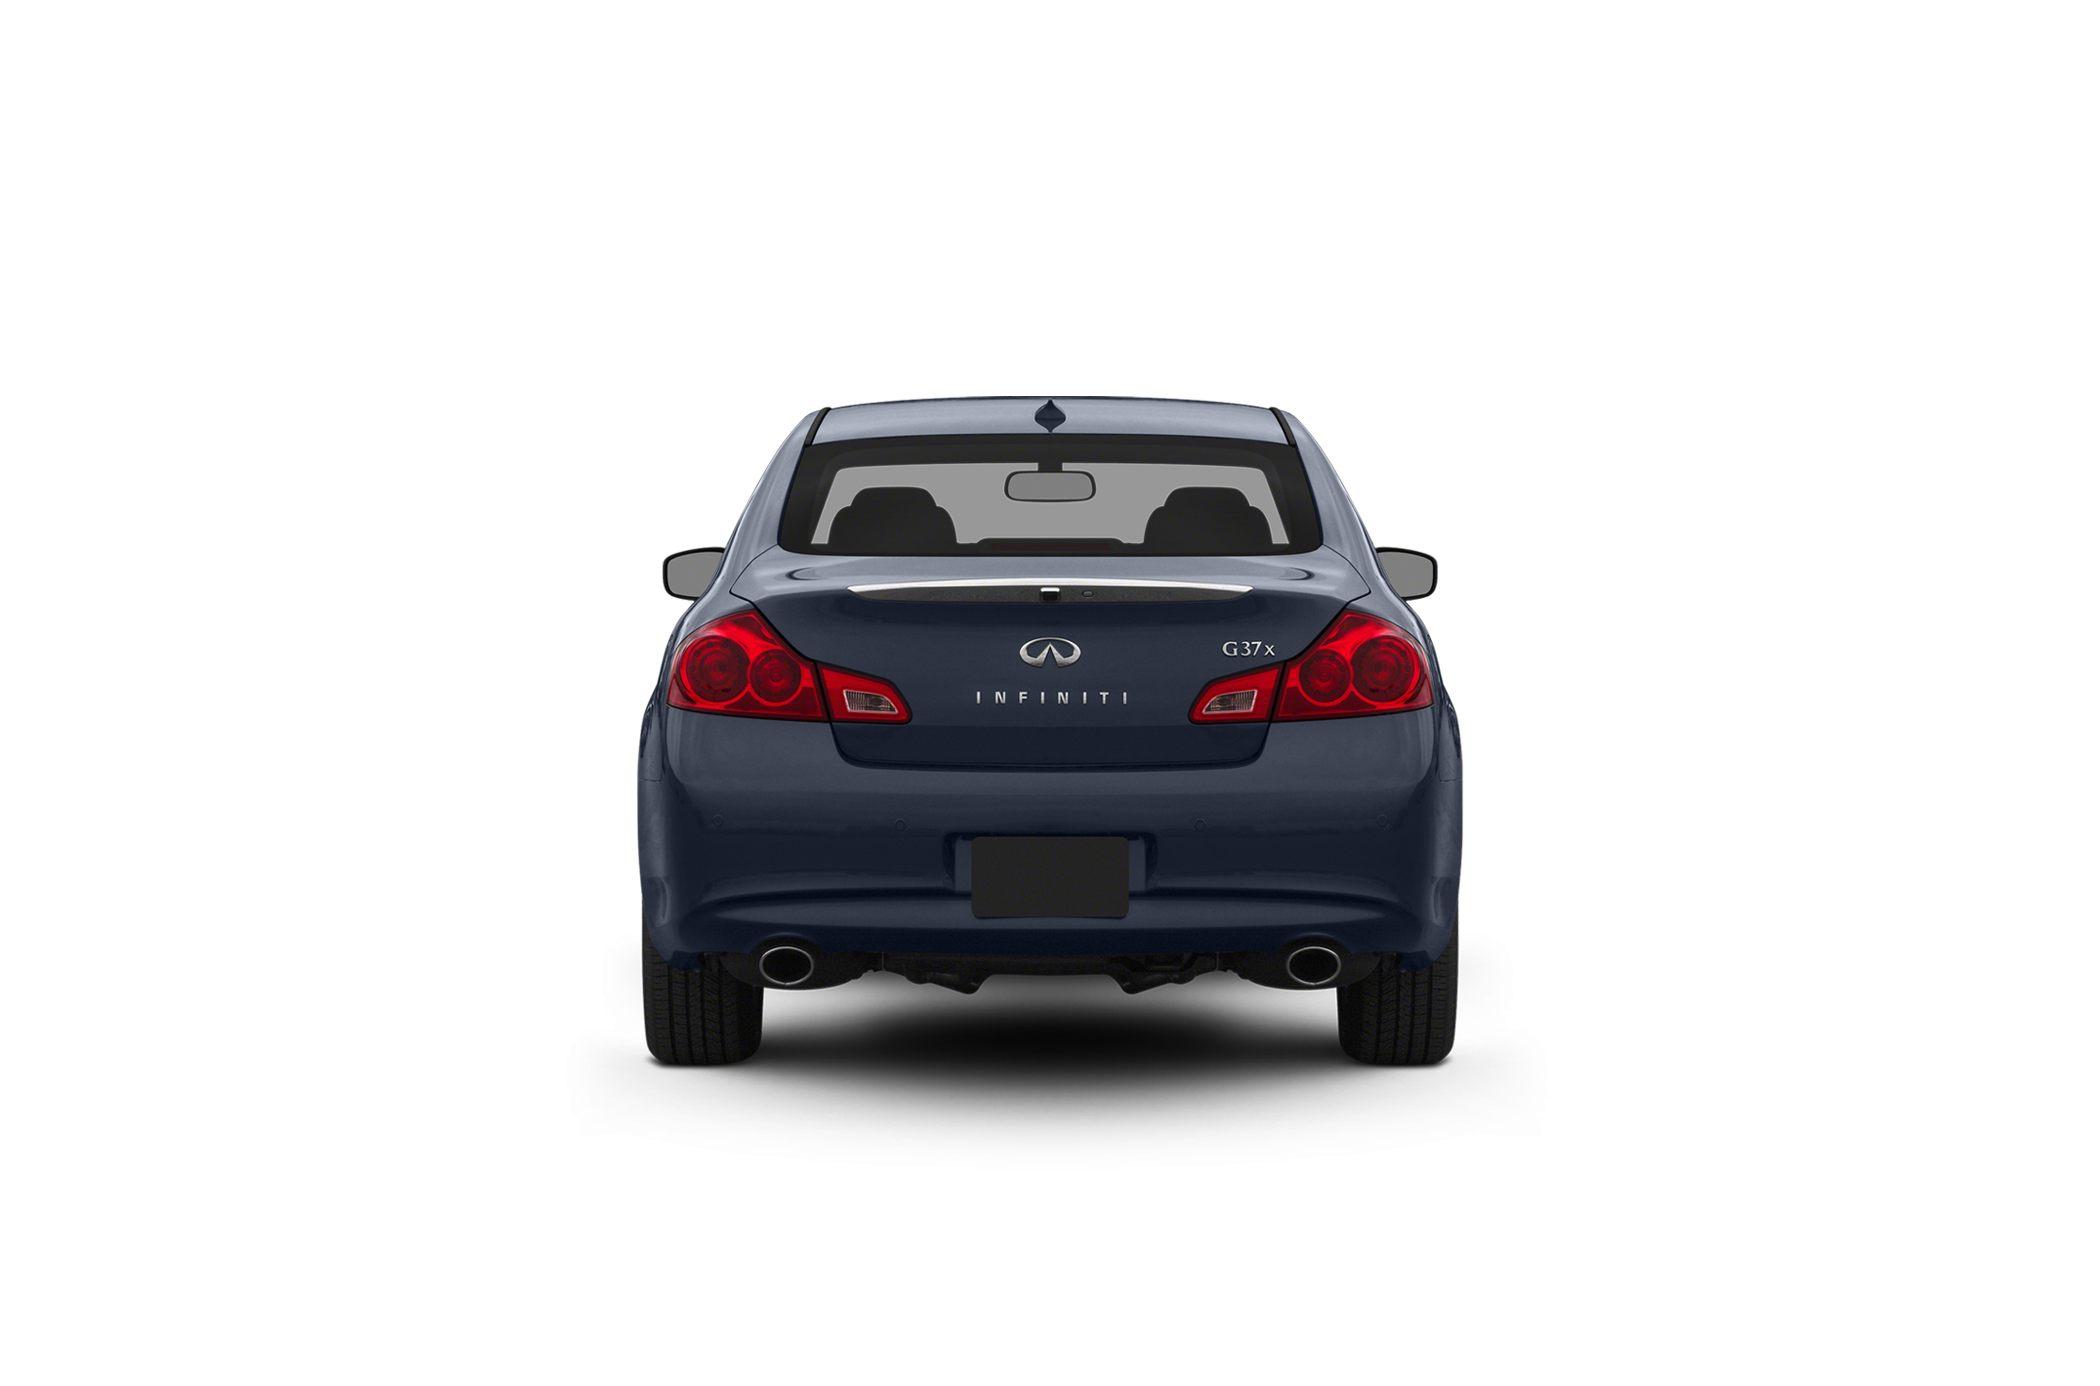 2010 Infiniti G37 Sedan Specs Safety Rating Amp Mpg